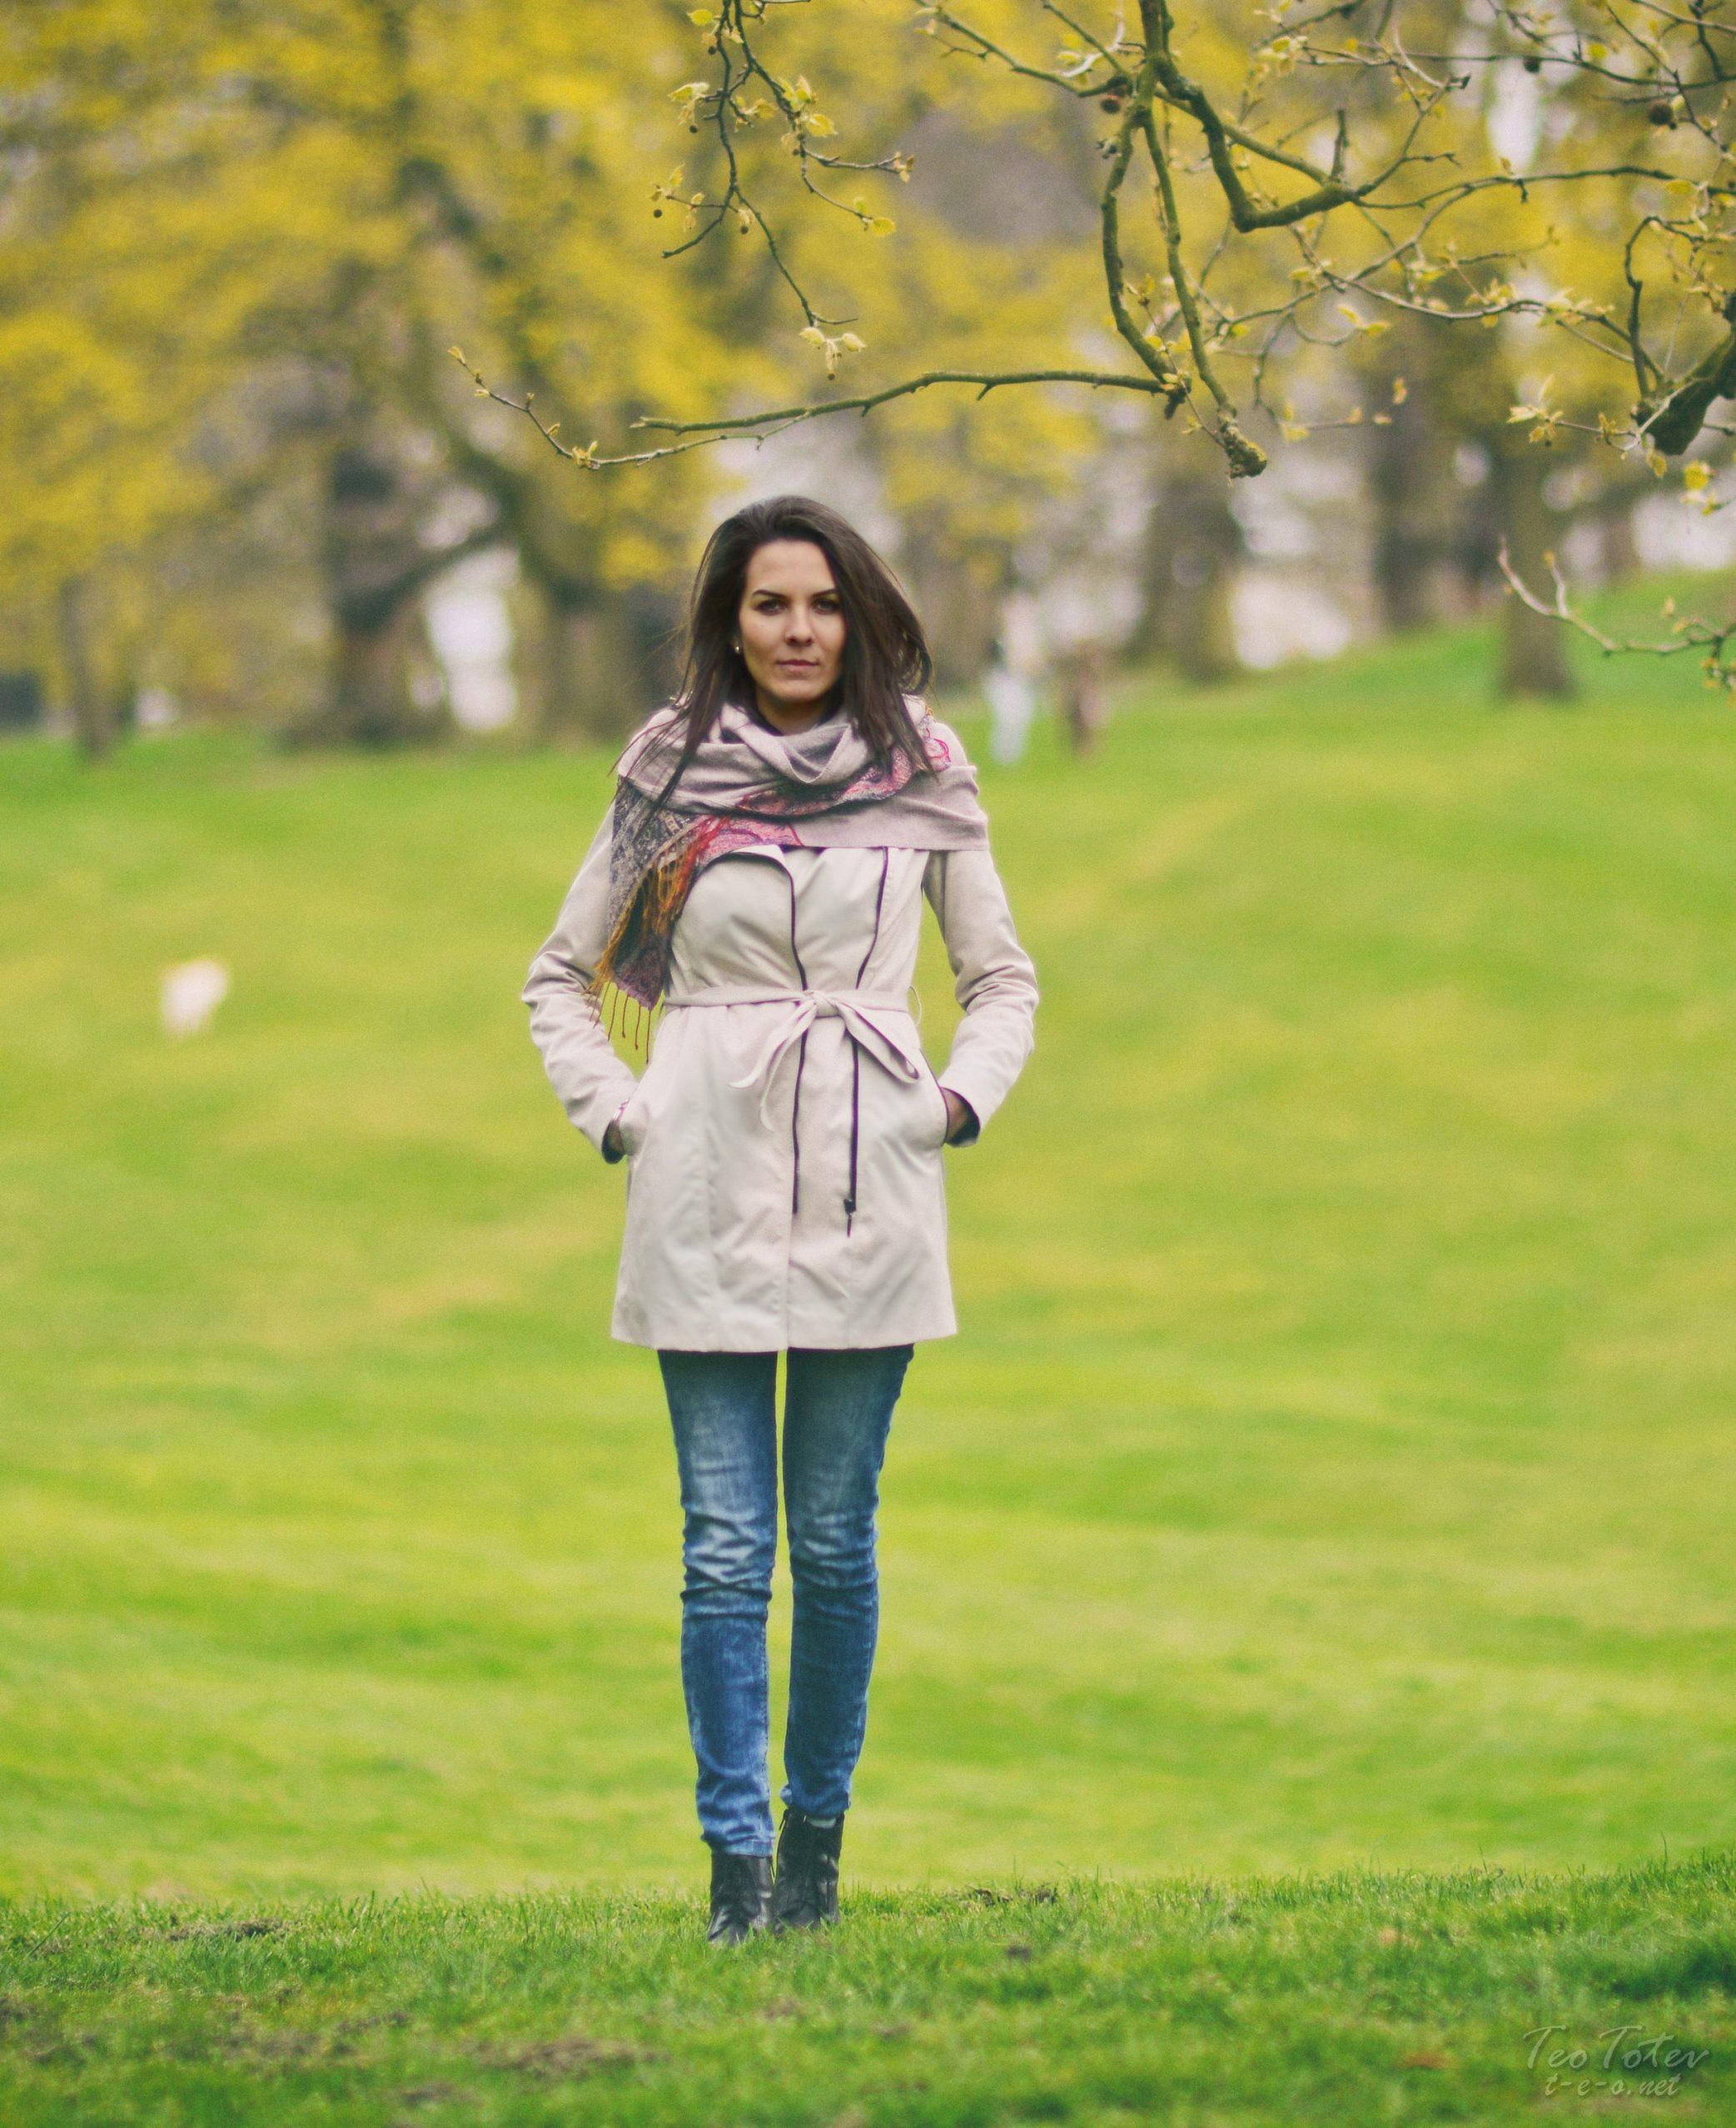 Autumn Fashion in Park